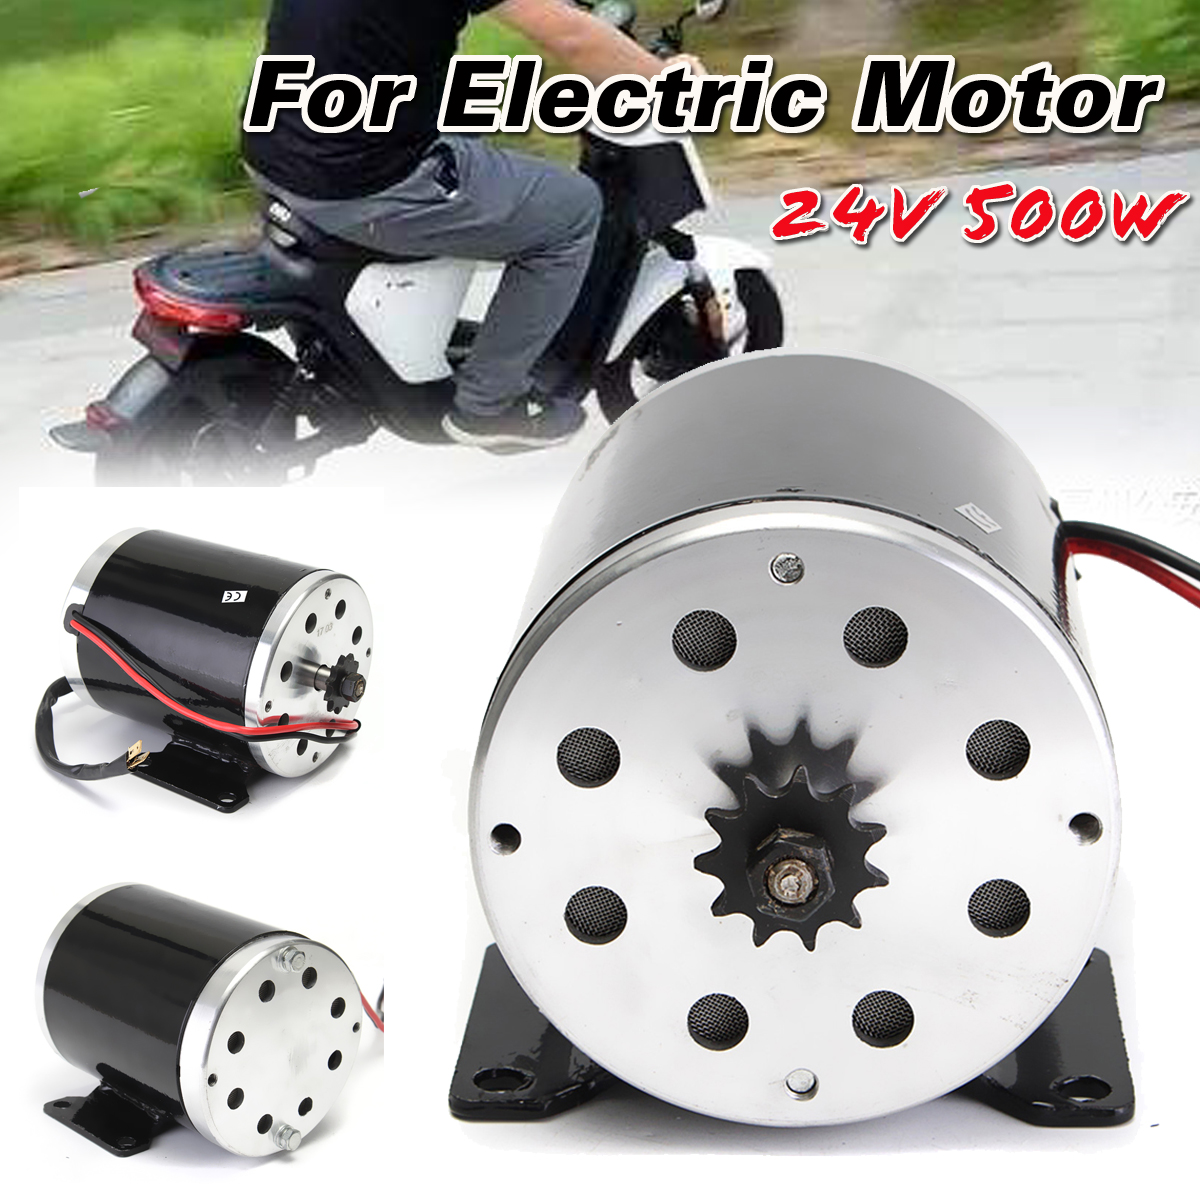 Здесь можно купить  New 24V 500W 28.5A Electric Brushed Motor 2800Rpm with bracket For Scooter E-Bike Mini Bike Go Kart  Электротехническое оборудование и материалы